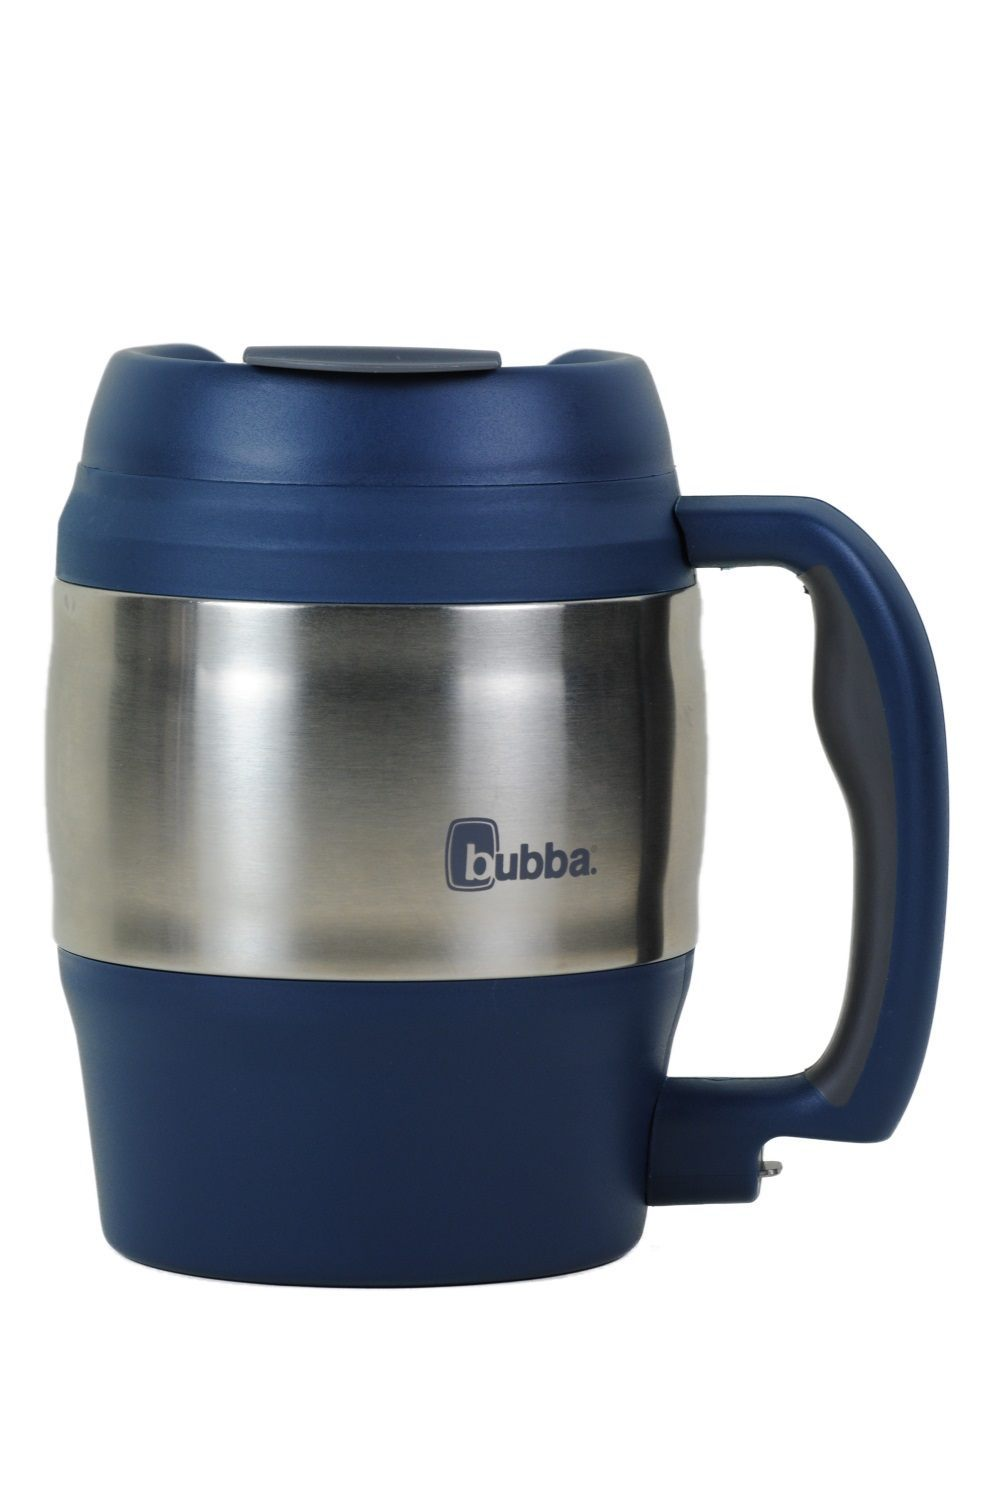 Bubba Travel Coffee Mug - Walmart.com